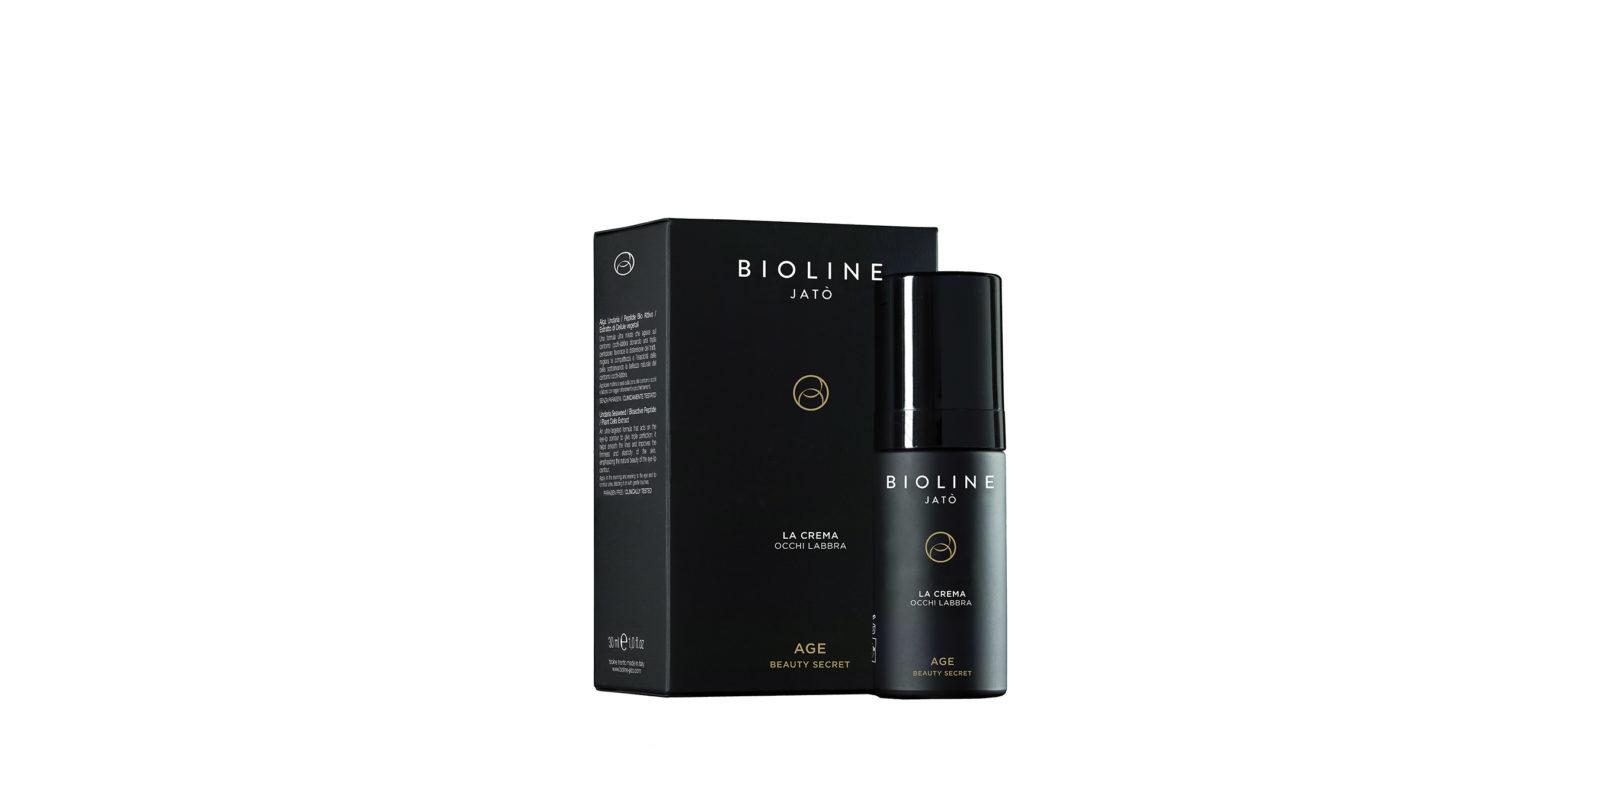 Linea Age Beauty Secret - Bioline Jatò